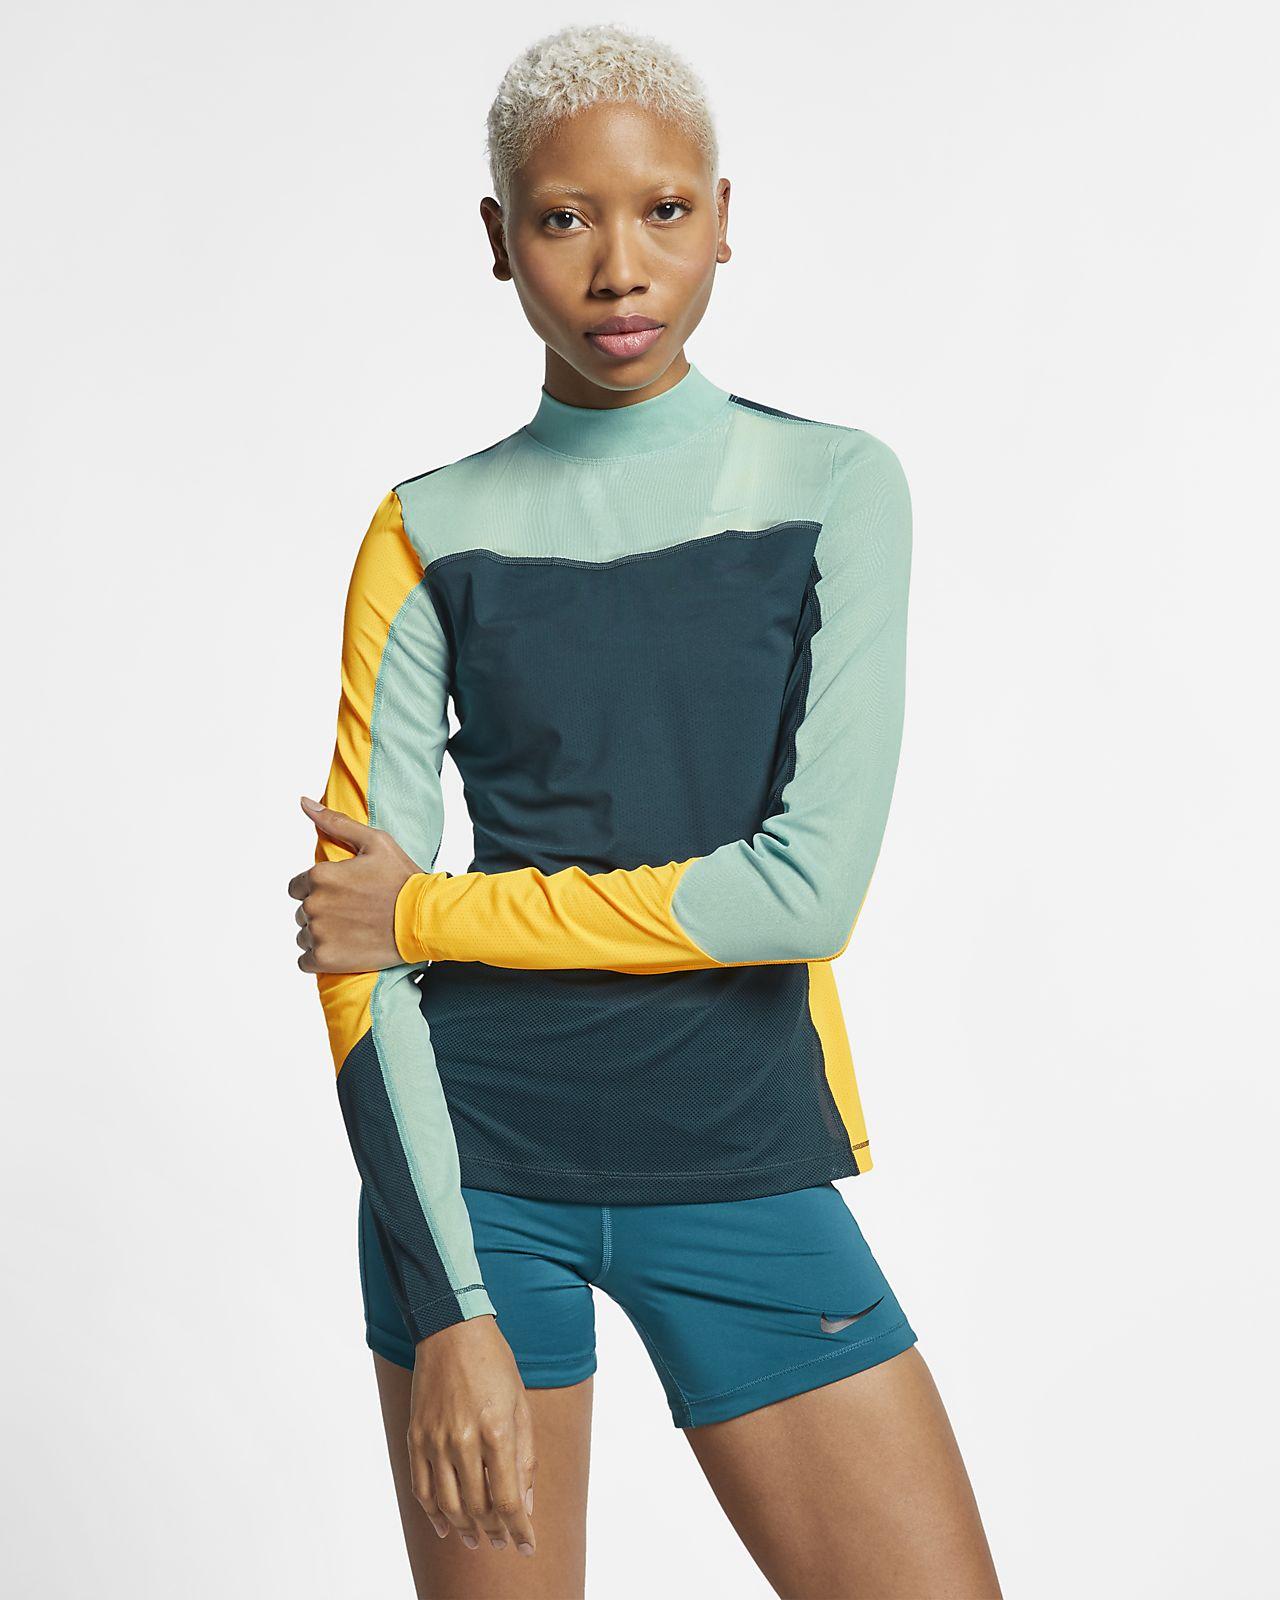 Prenda para la parte superior de manga larga para mujer Nike Pro HyperCool